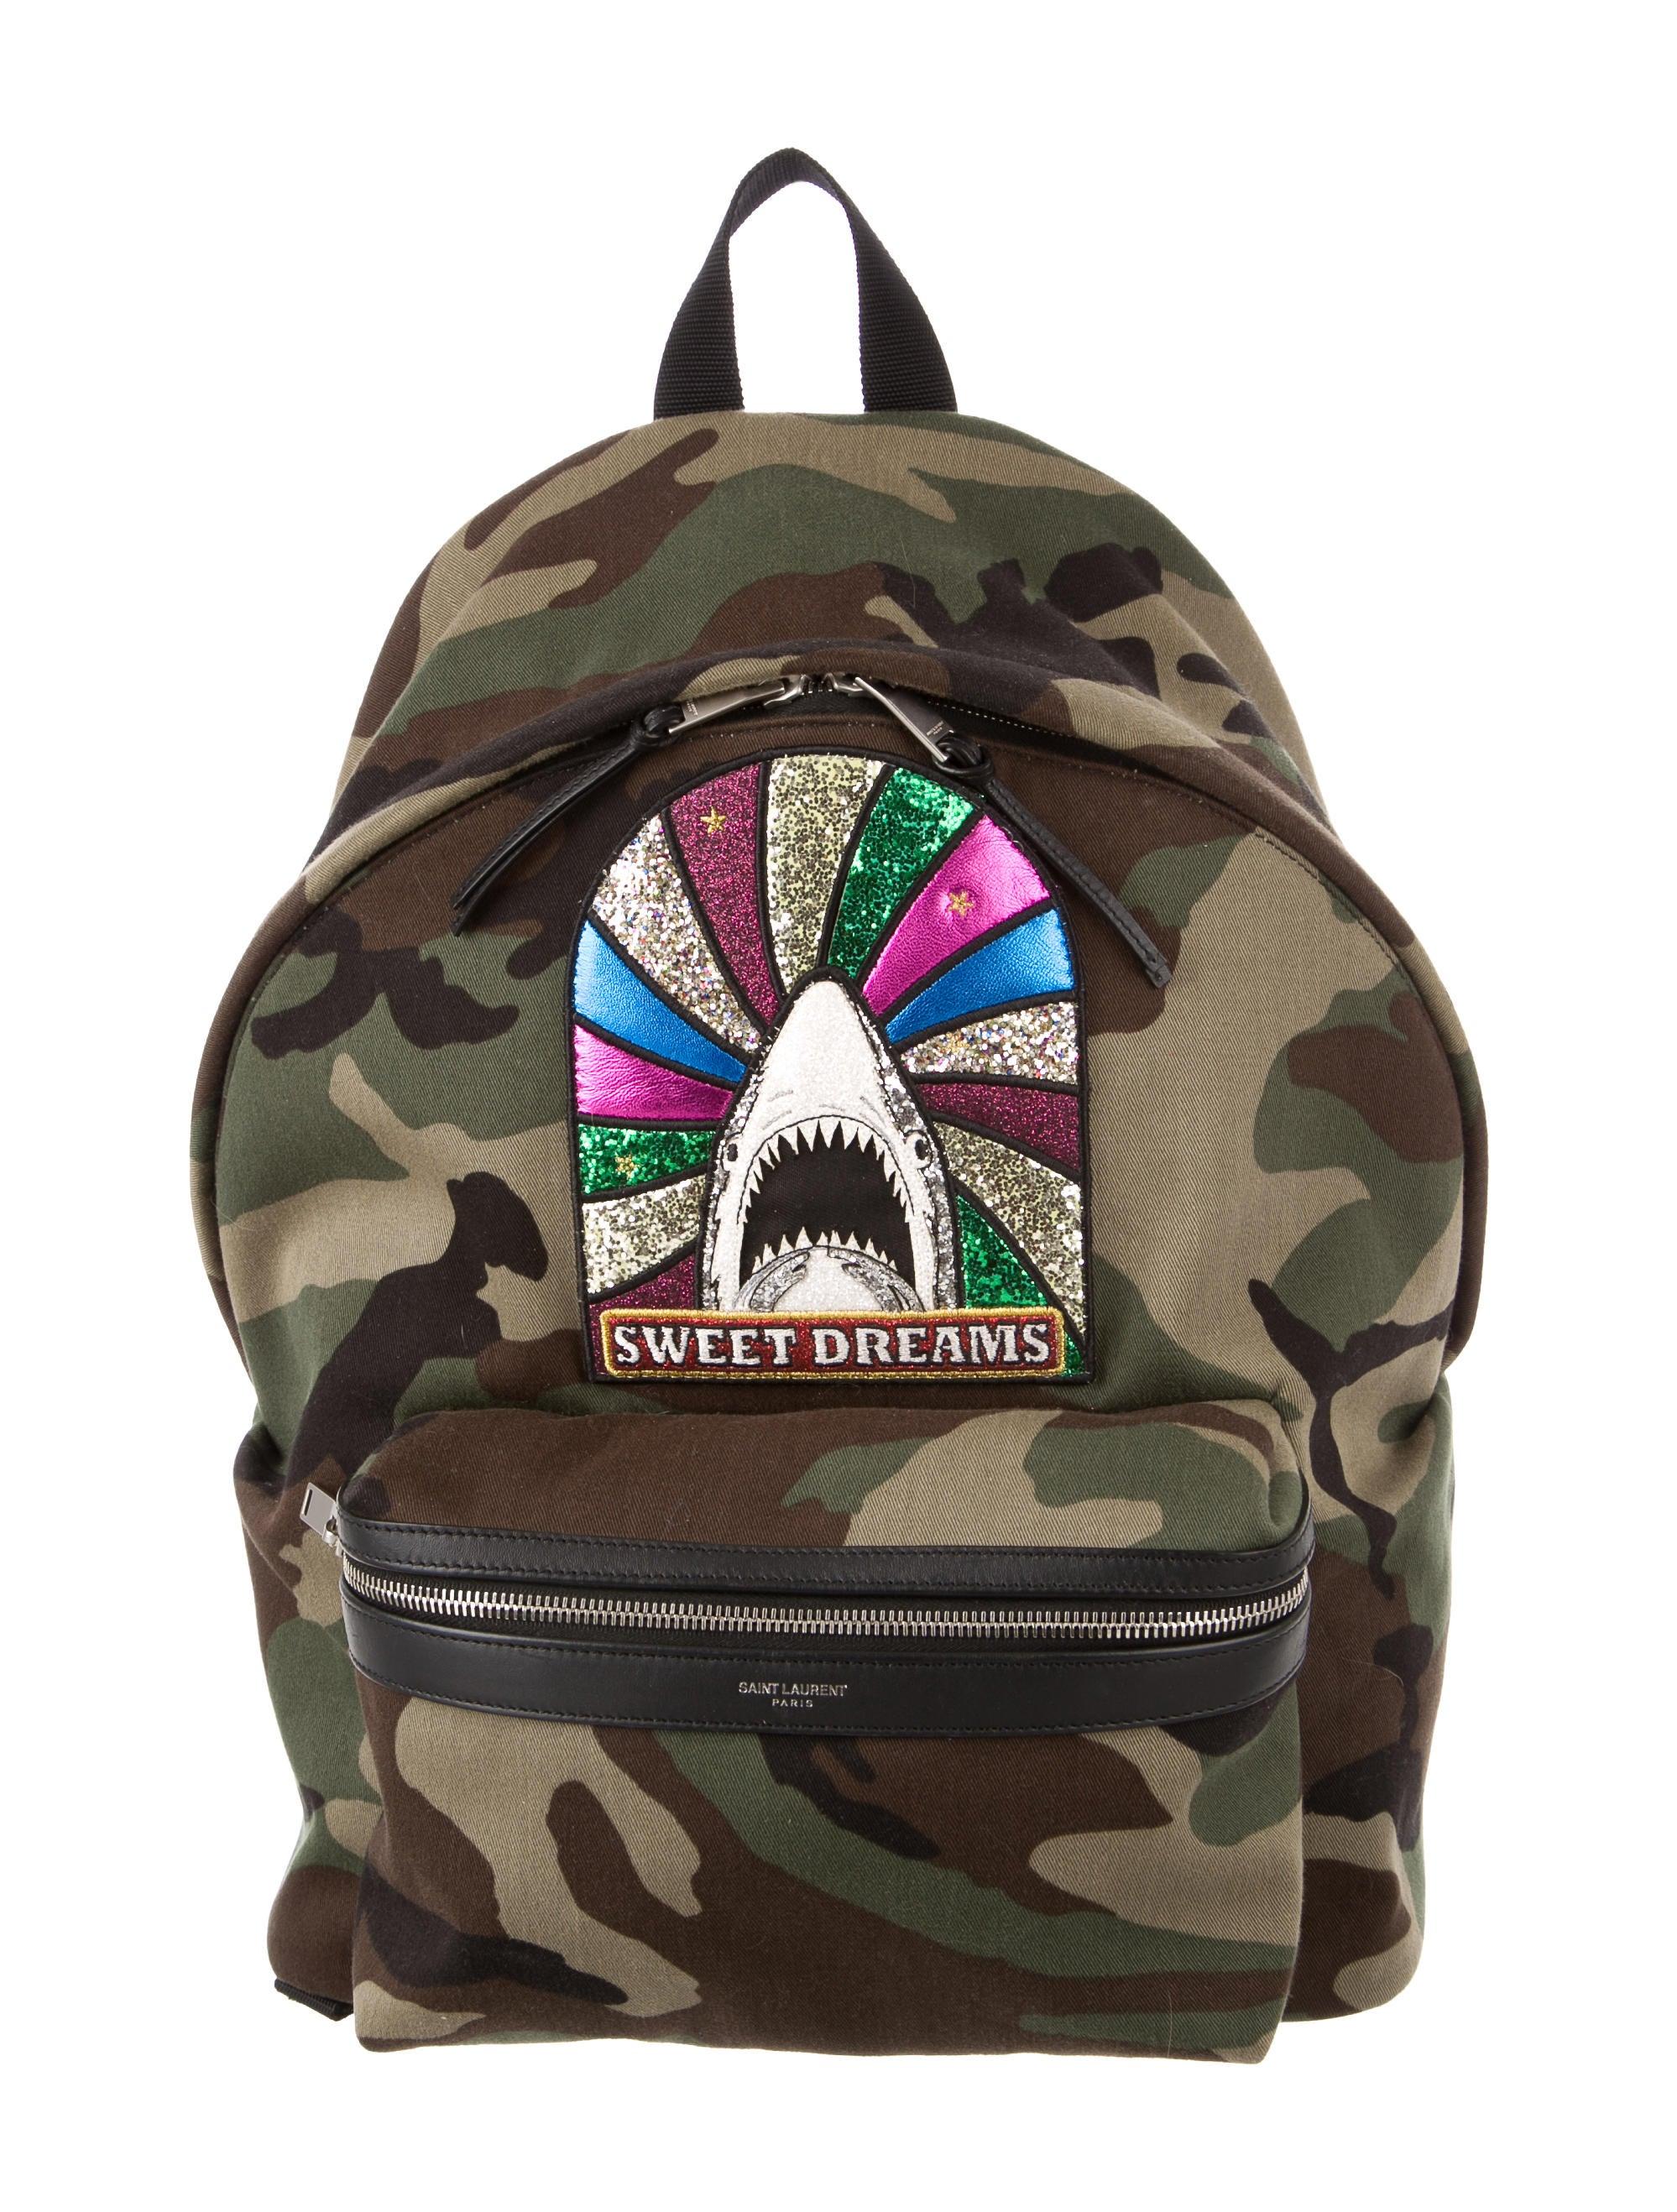 1e8cc013b3 Saint Laurent Giant City Sweet Dreams Backpack - Handbags - SNT39734 ...